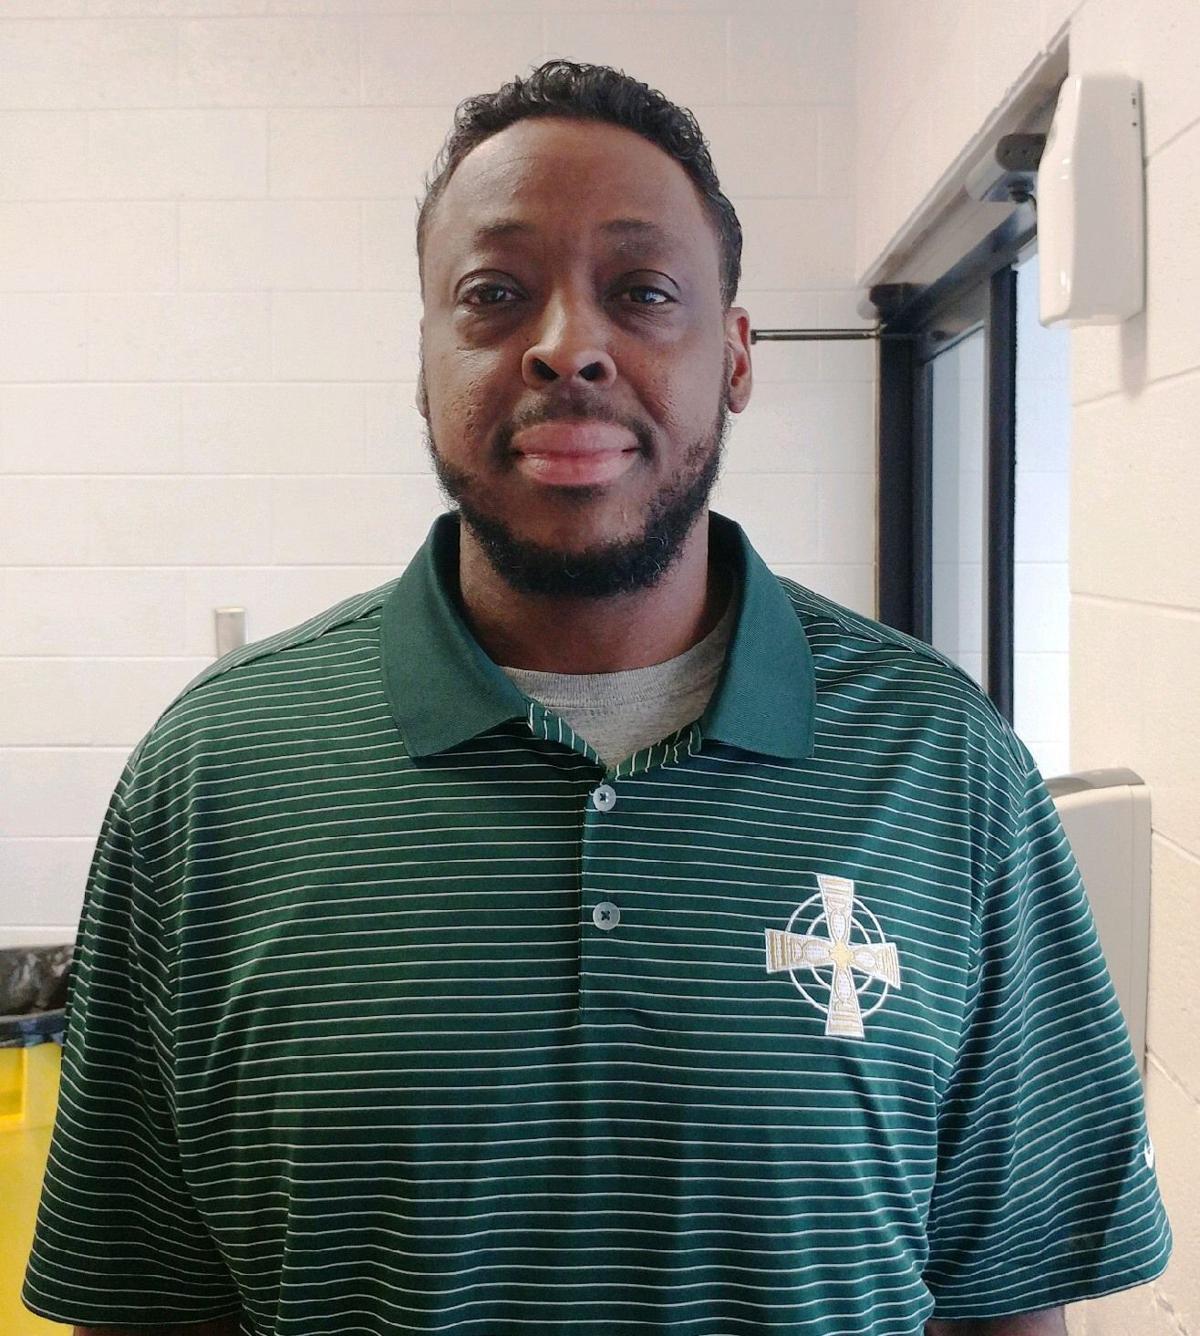 Shawn Good, Roanoke Catholic boys basketball coach